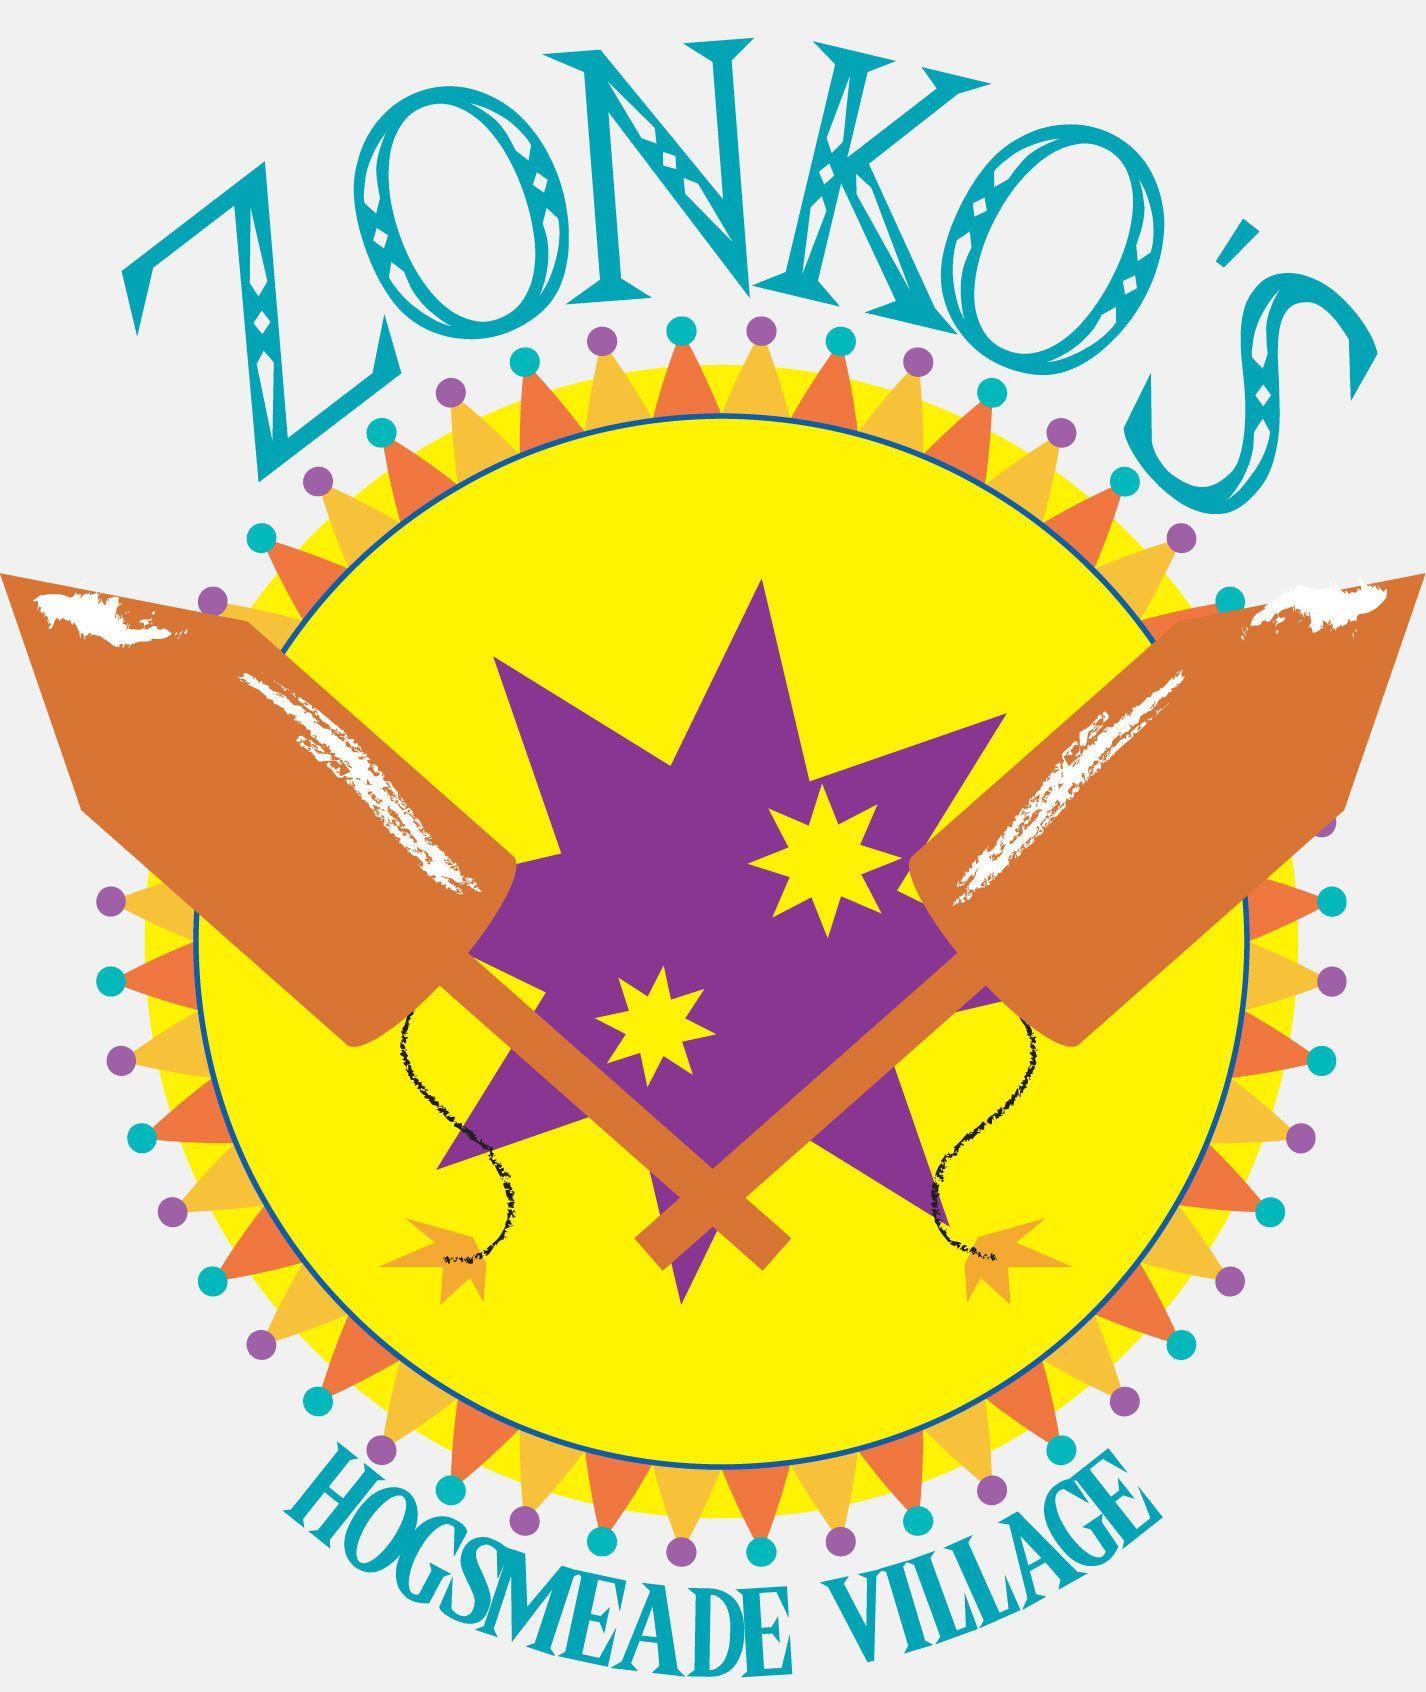 Zonko's Joke Shop Logo white by opaleyes HP_Hogsmeade